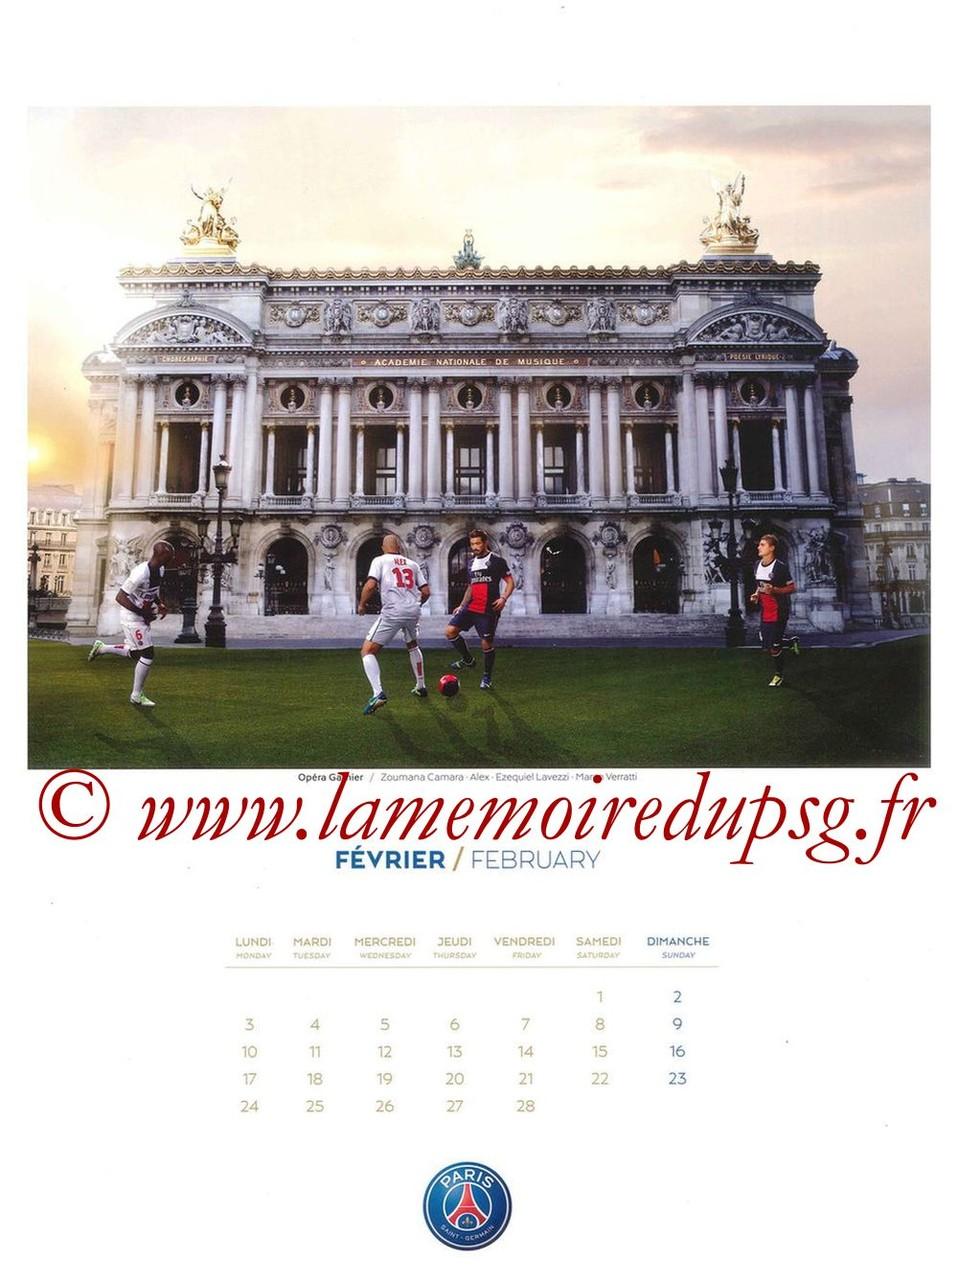 Calendrier PSG 2014 - Page 02 - Opéra Garnier